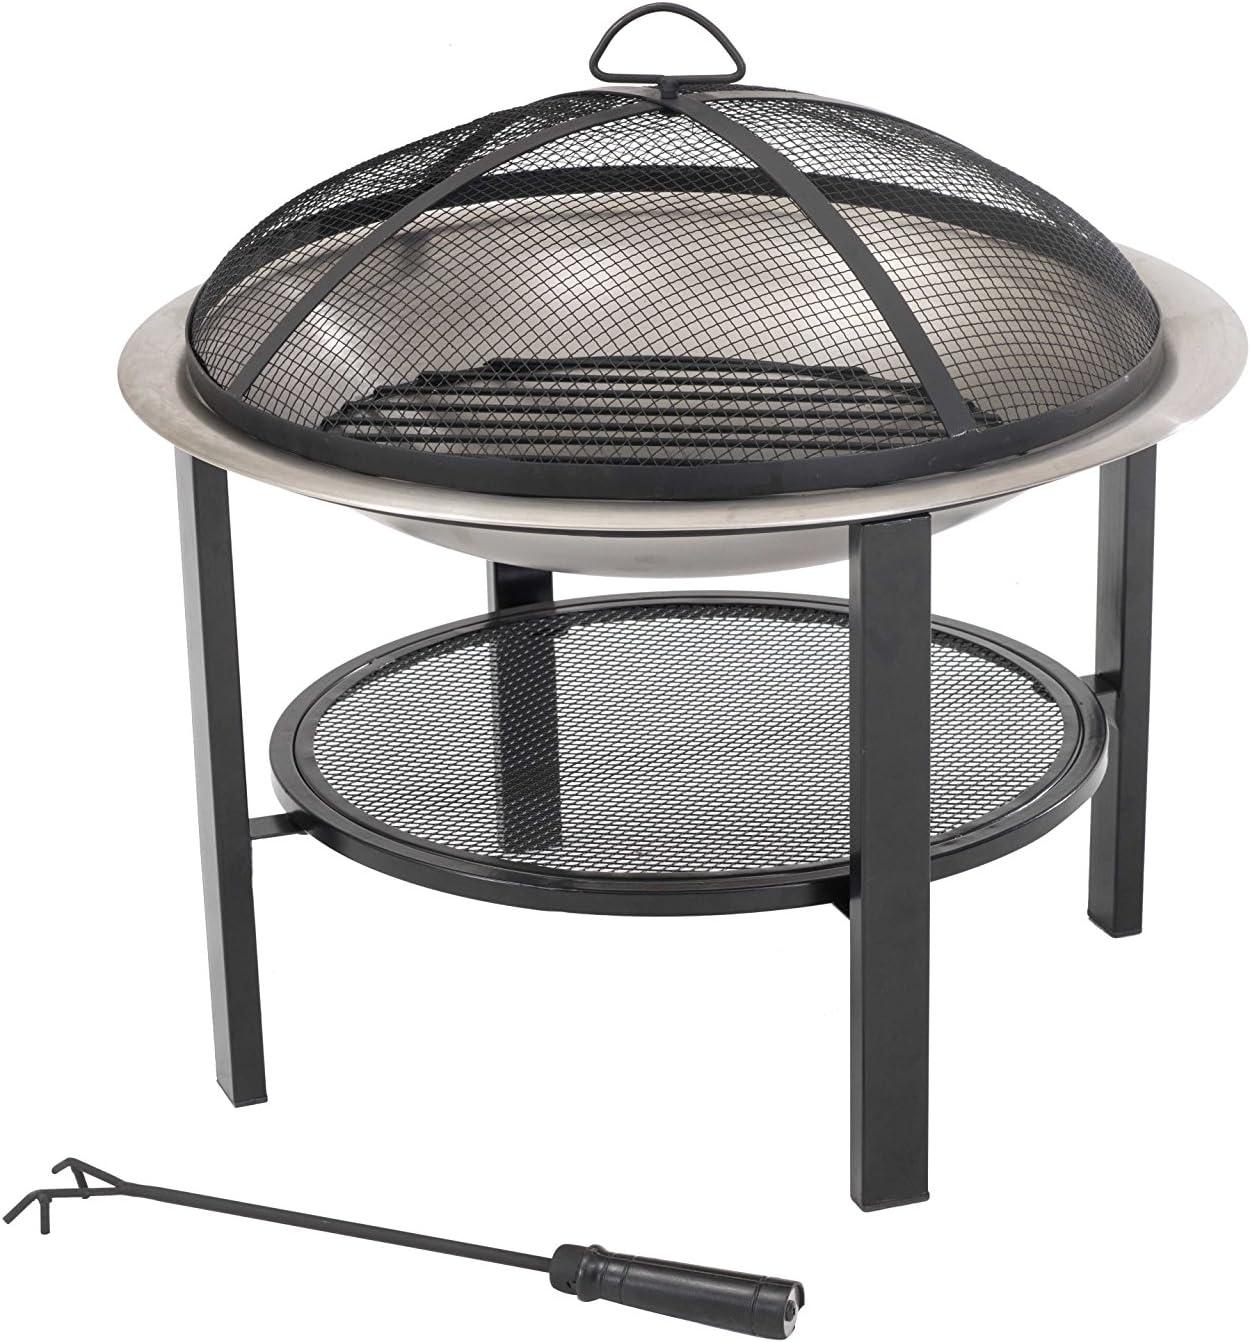 Sunjoy 26 Verde Stainless Steel Fire Pit